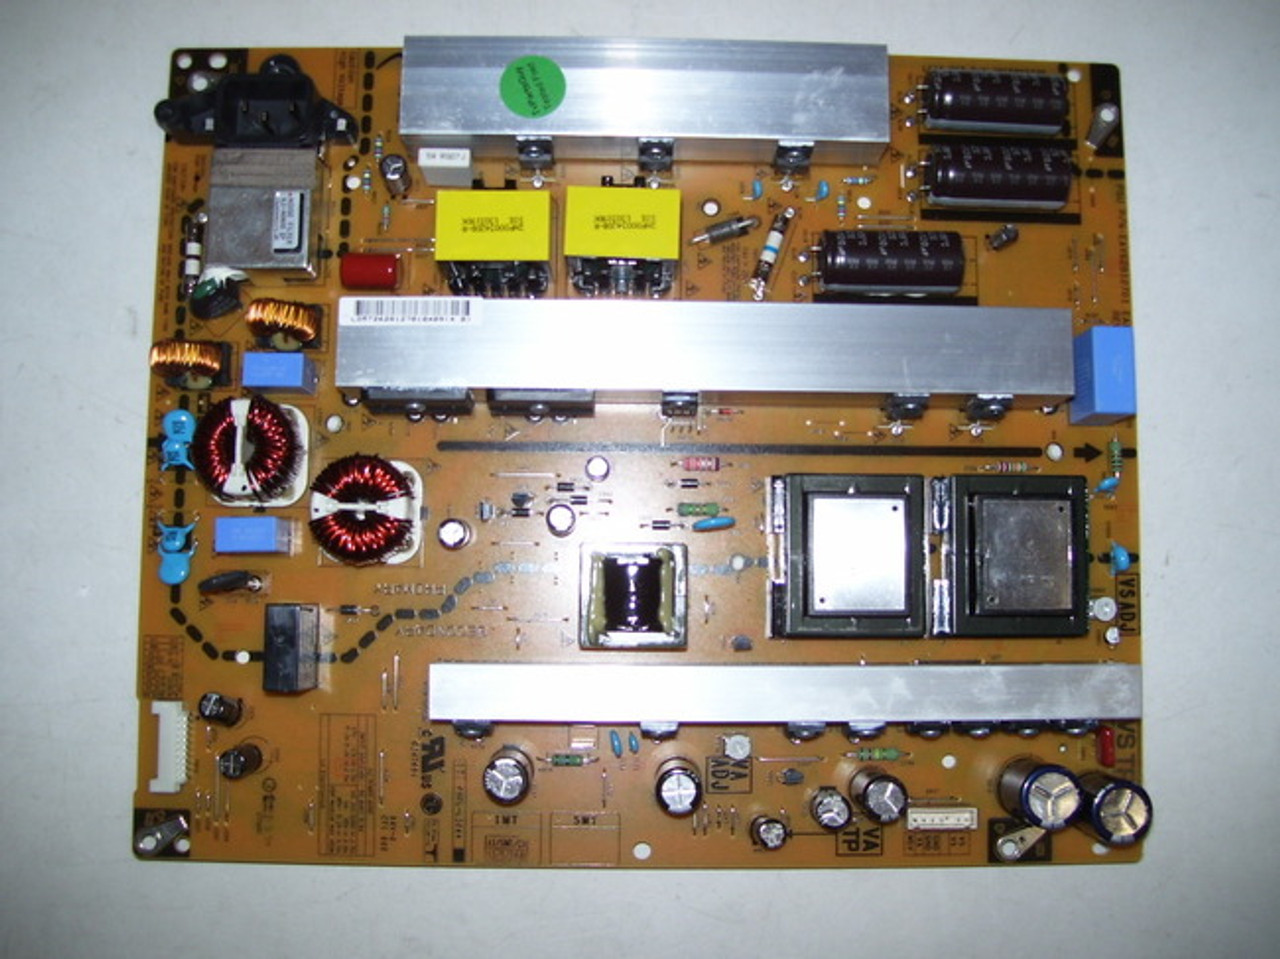 LG 60PN5700 Power Supply board EAX64880001 / EAY62812701 - TvPartsGuy.com